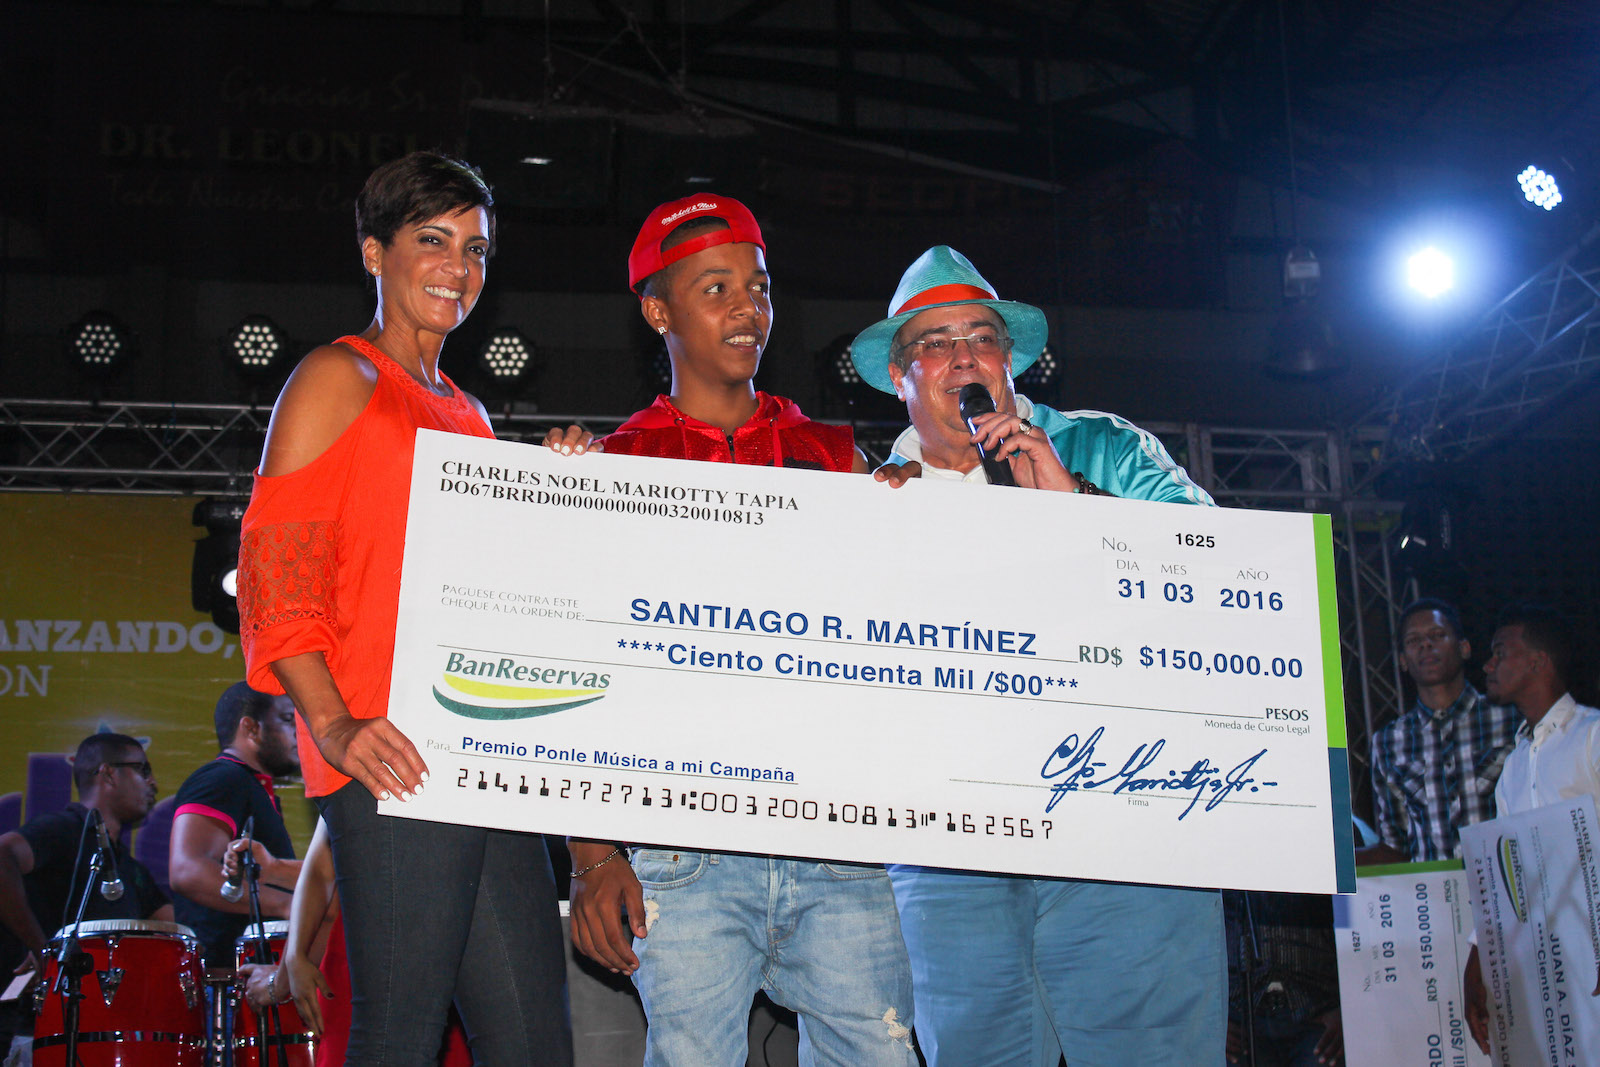 Charlie Mariotti premio campaña música abr 10 2016